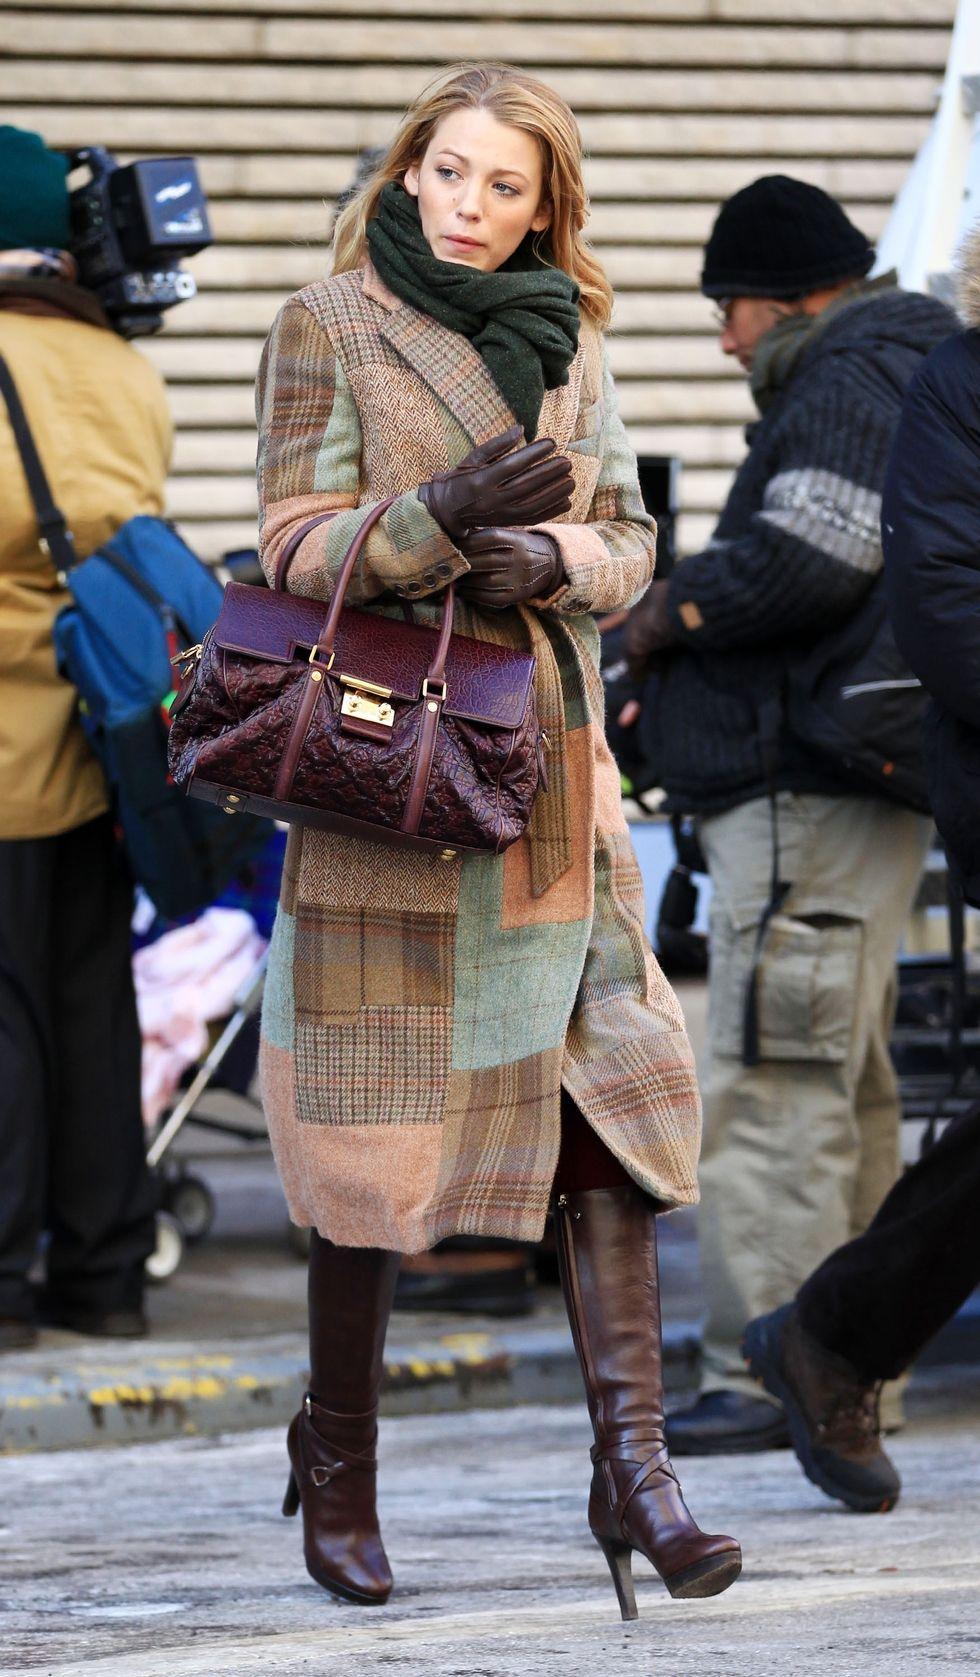 Der Van Serena Gossip 72 Looks Woodsen's Best Pinterest Girl APwyqOw4Z